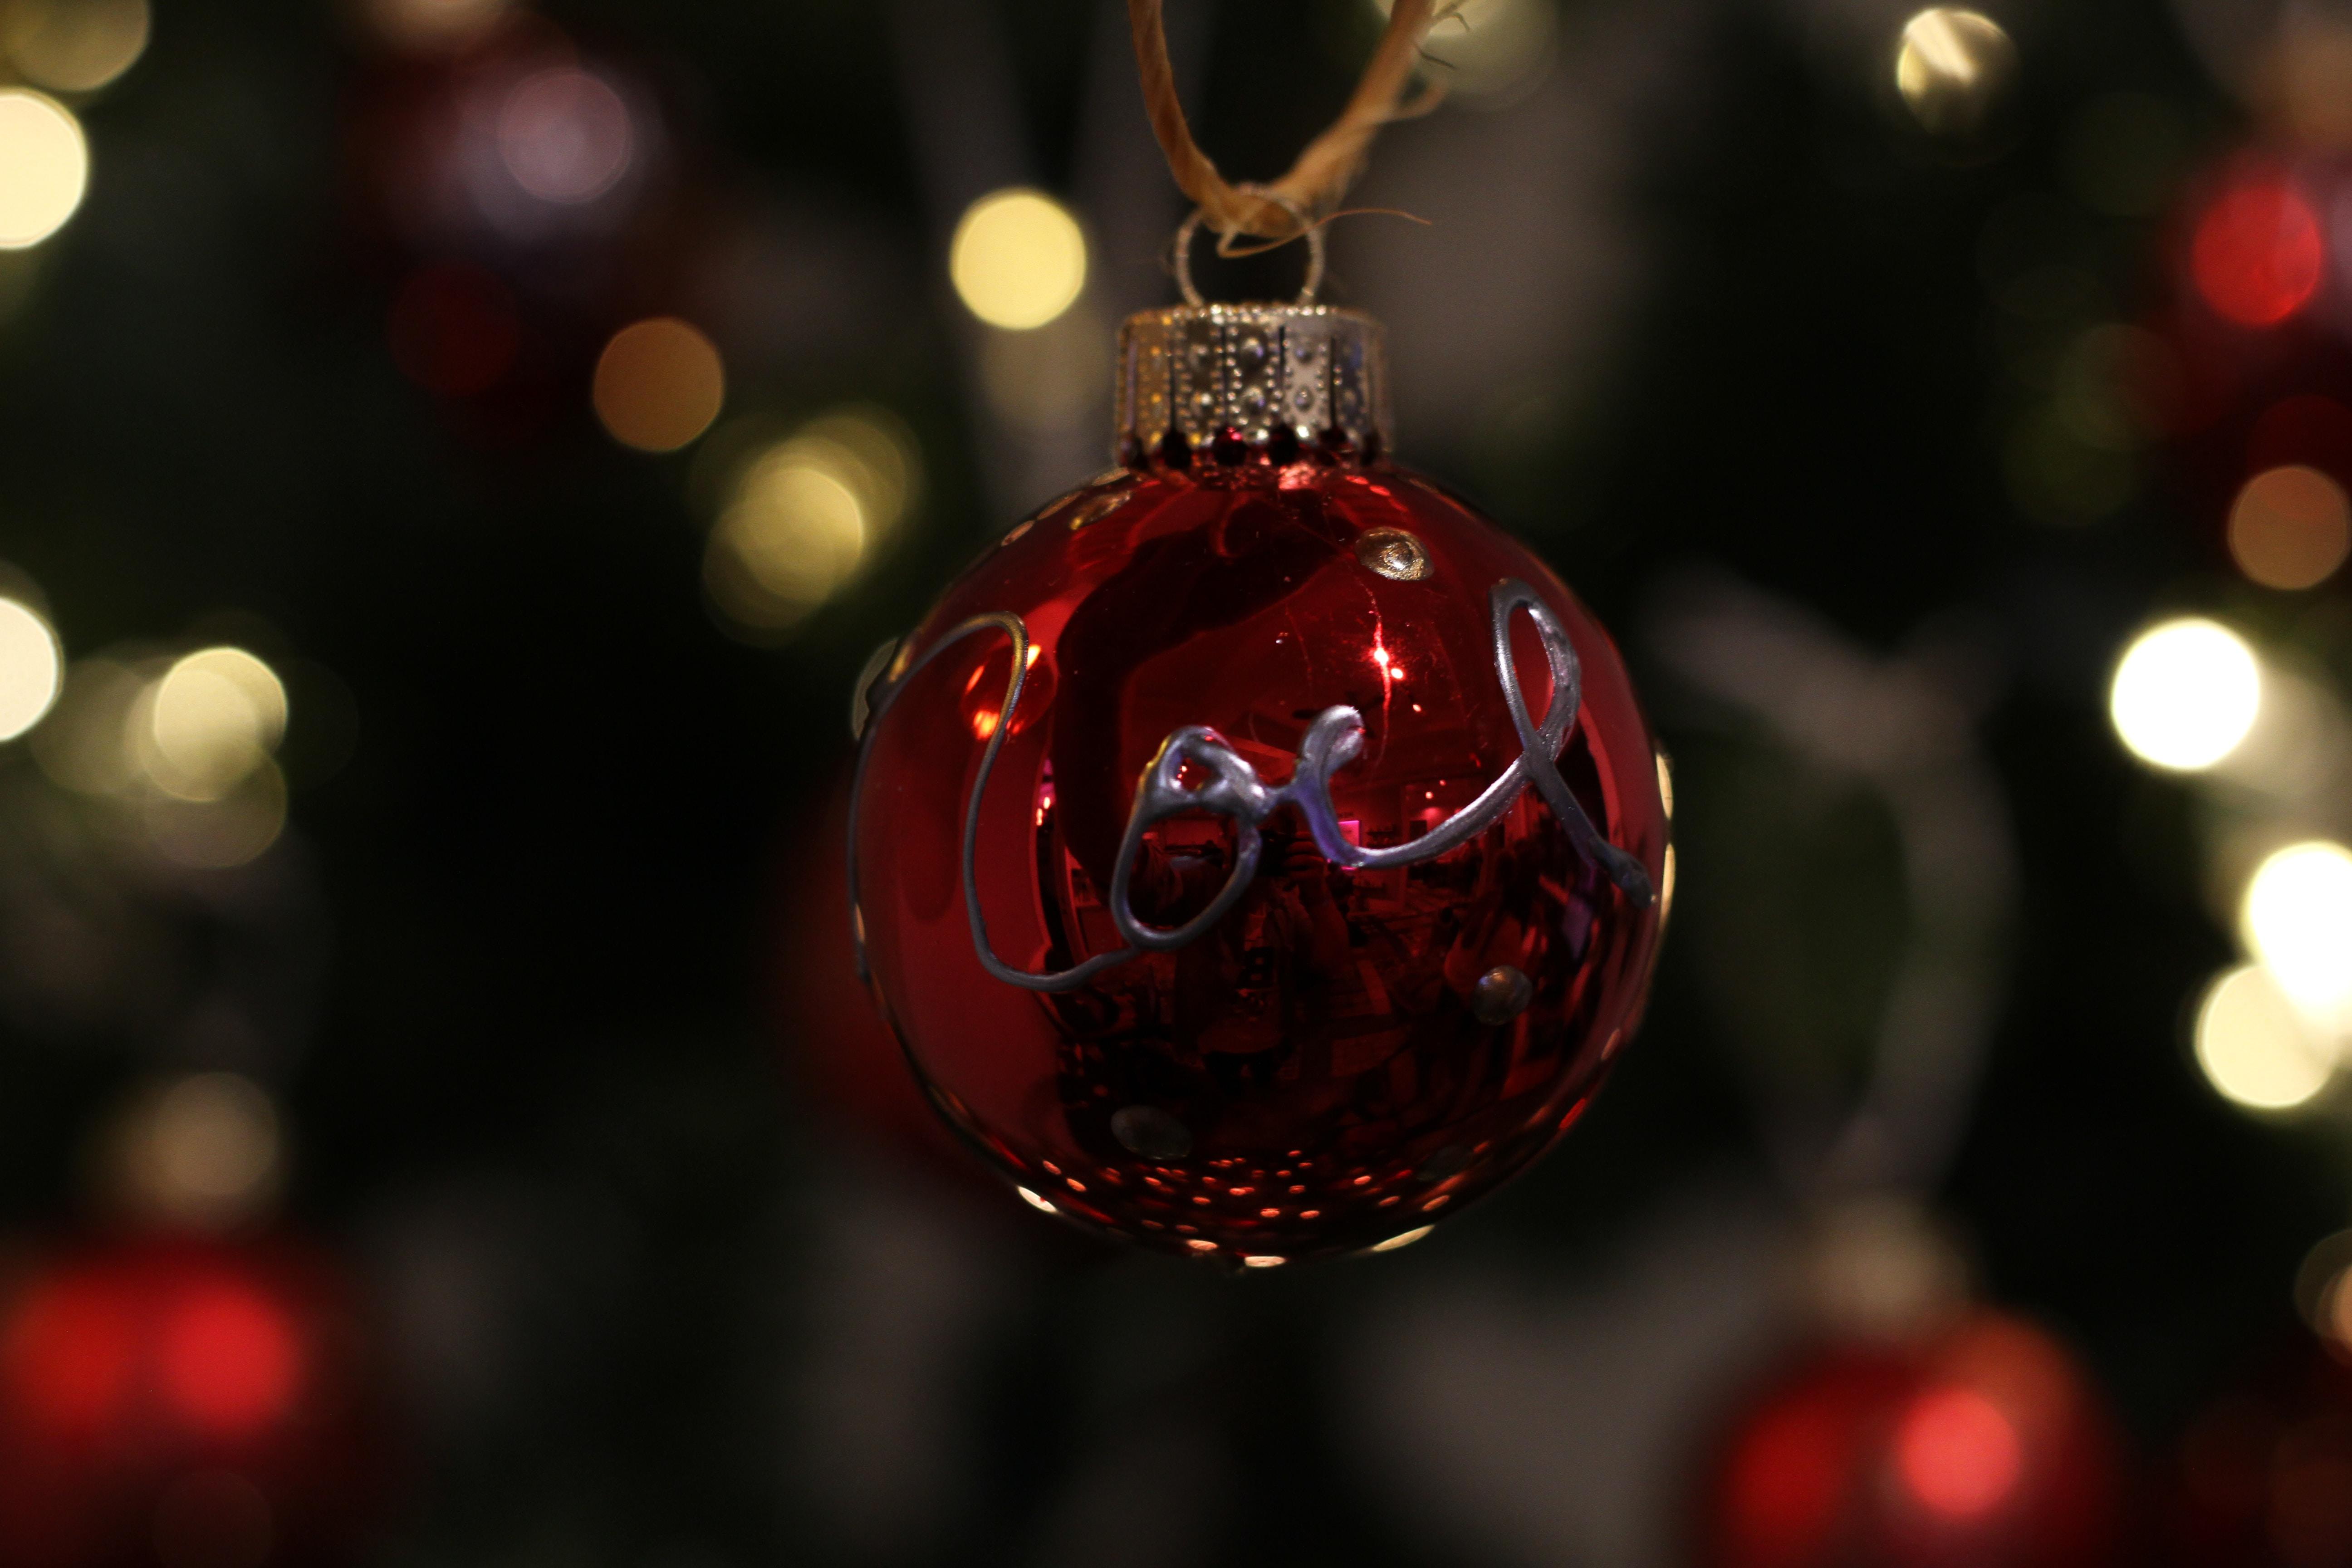 A red XMAS tree ornament.